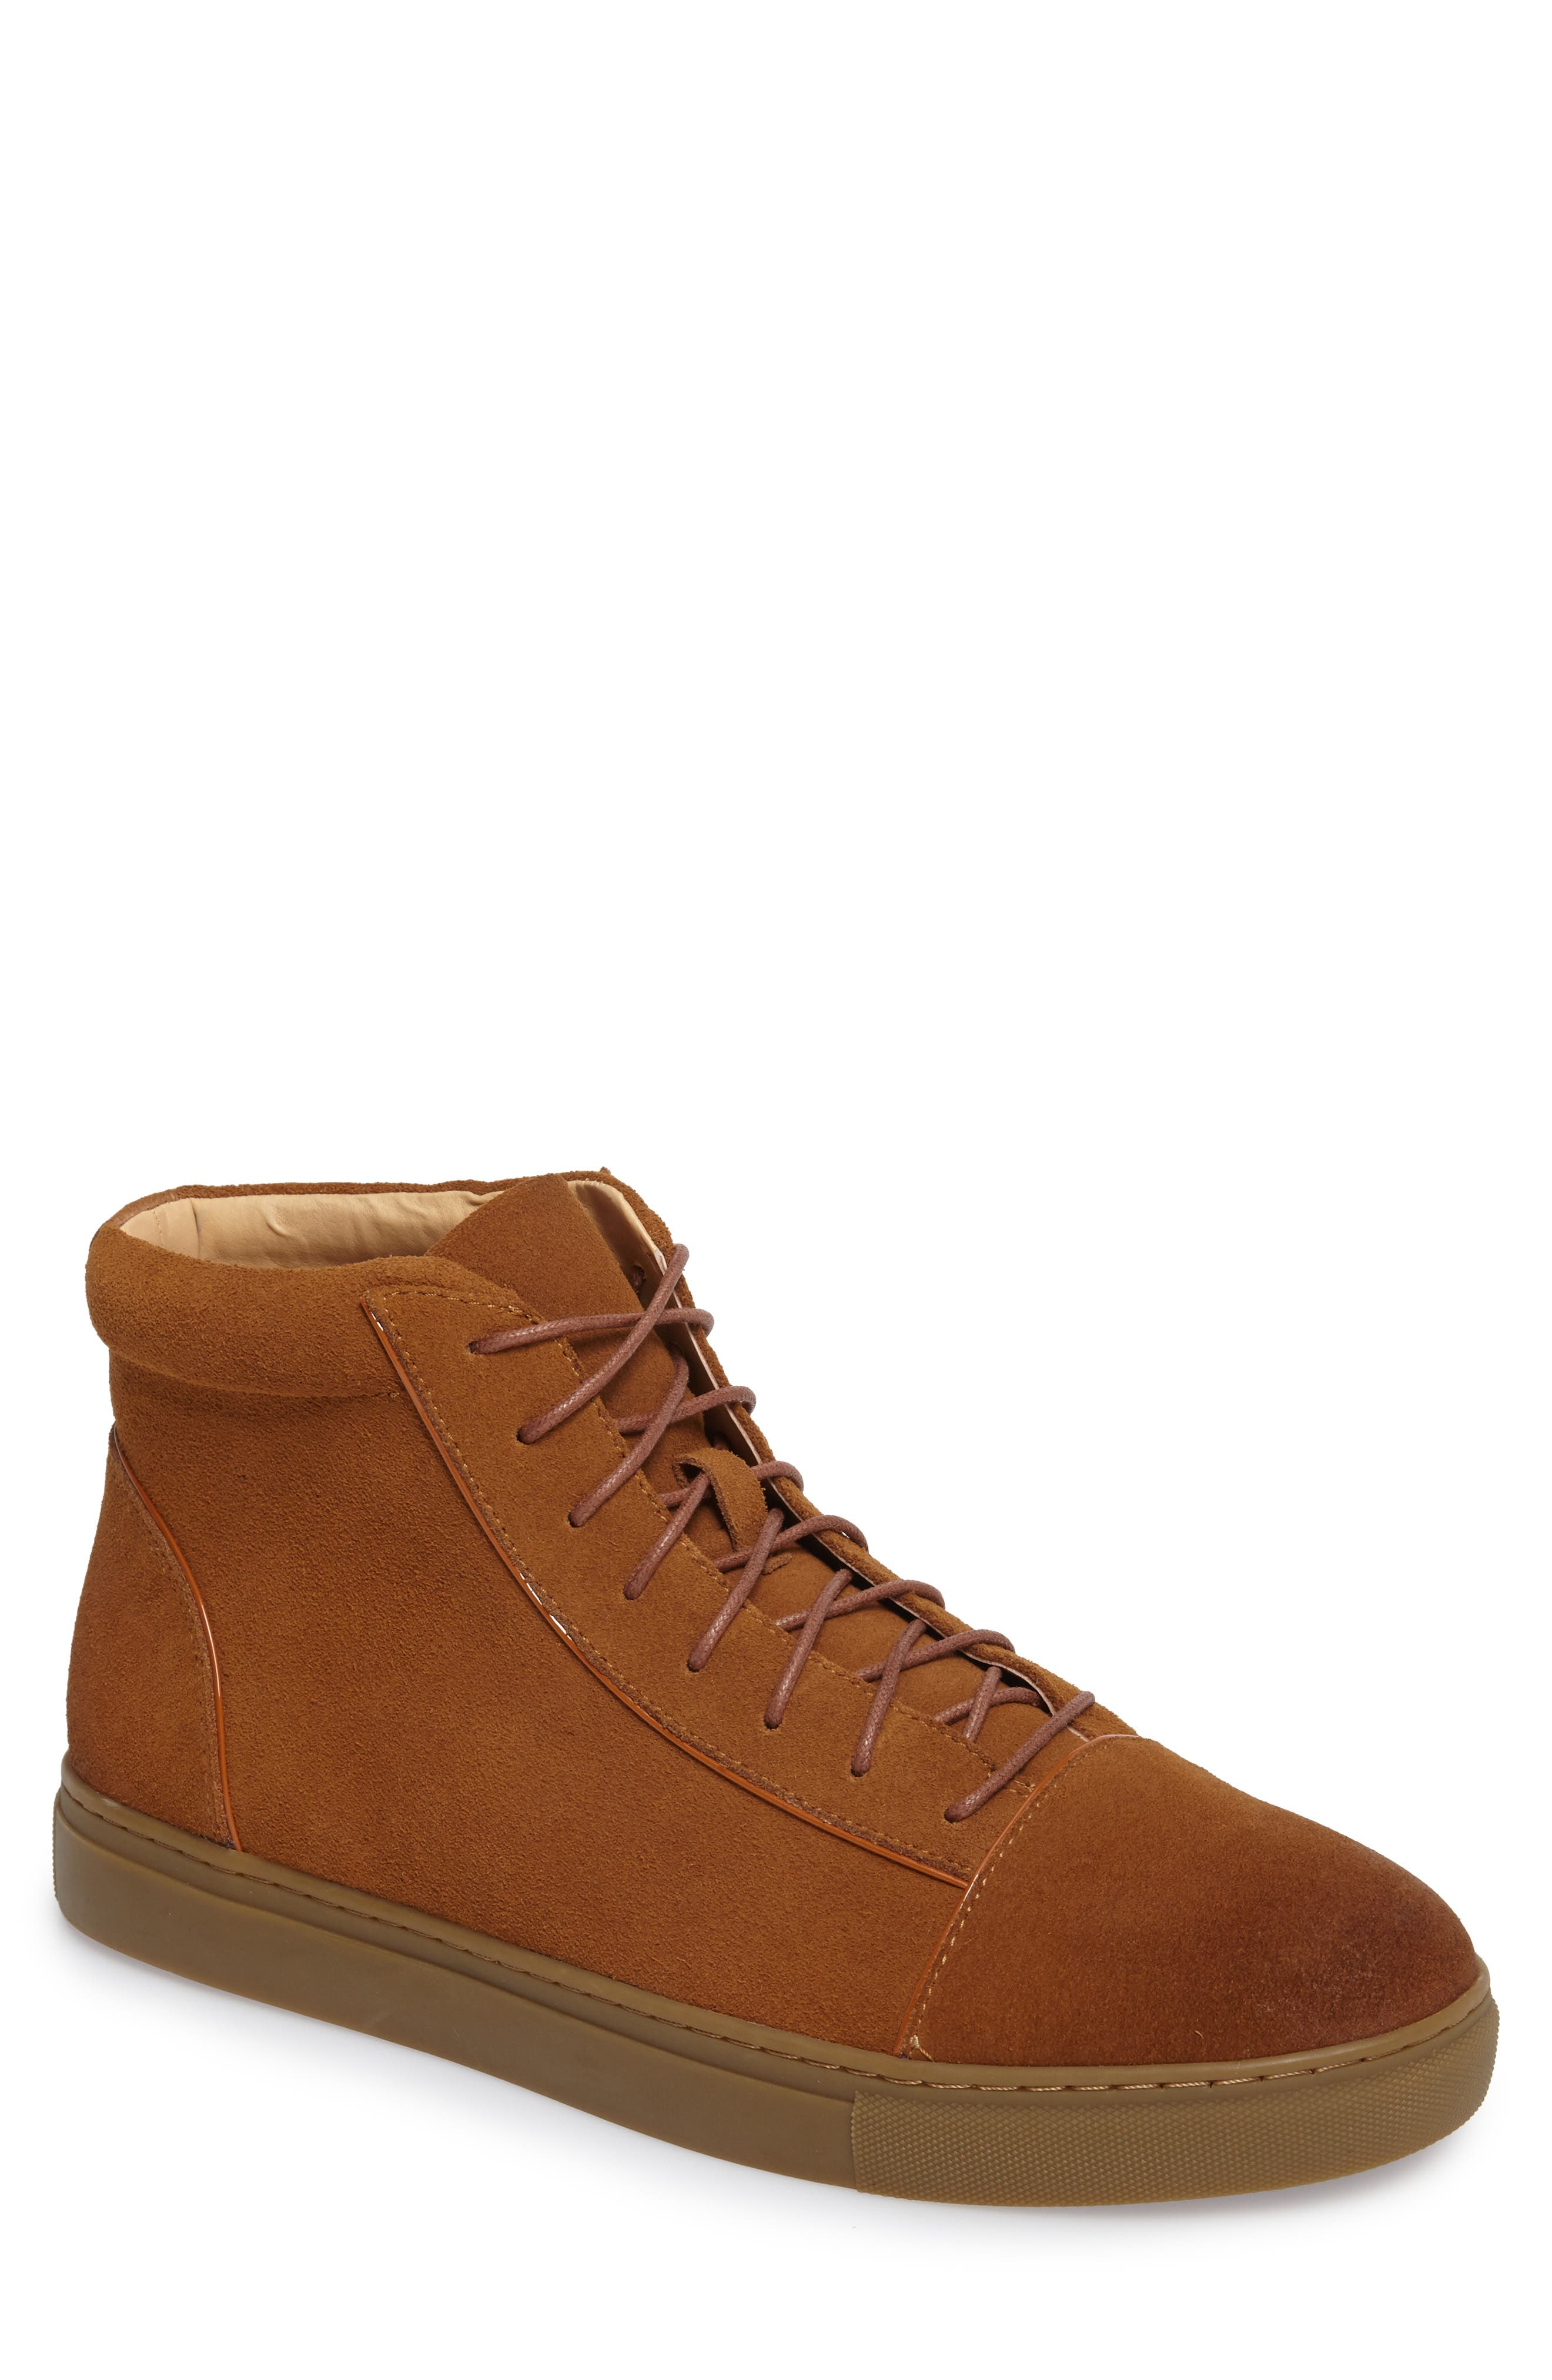 Alternate Image 1 Selected - English Laundry Grundy Sneaker (Men)